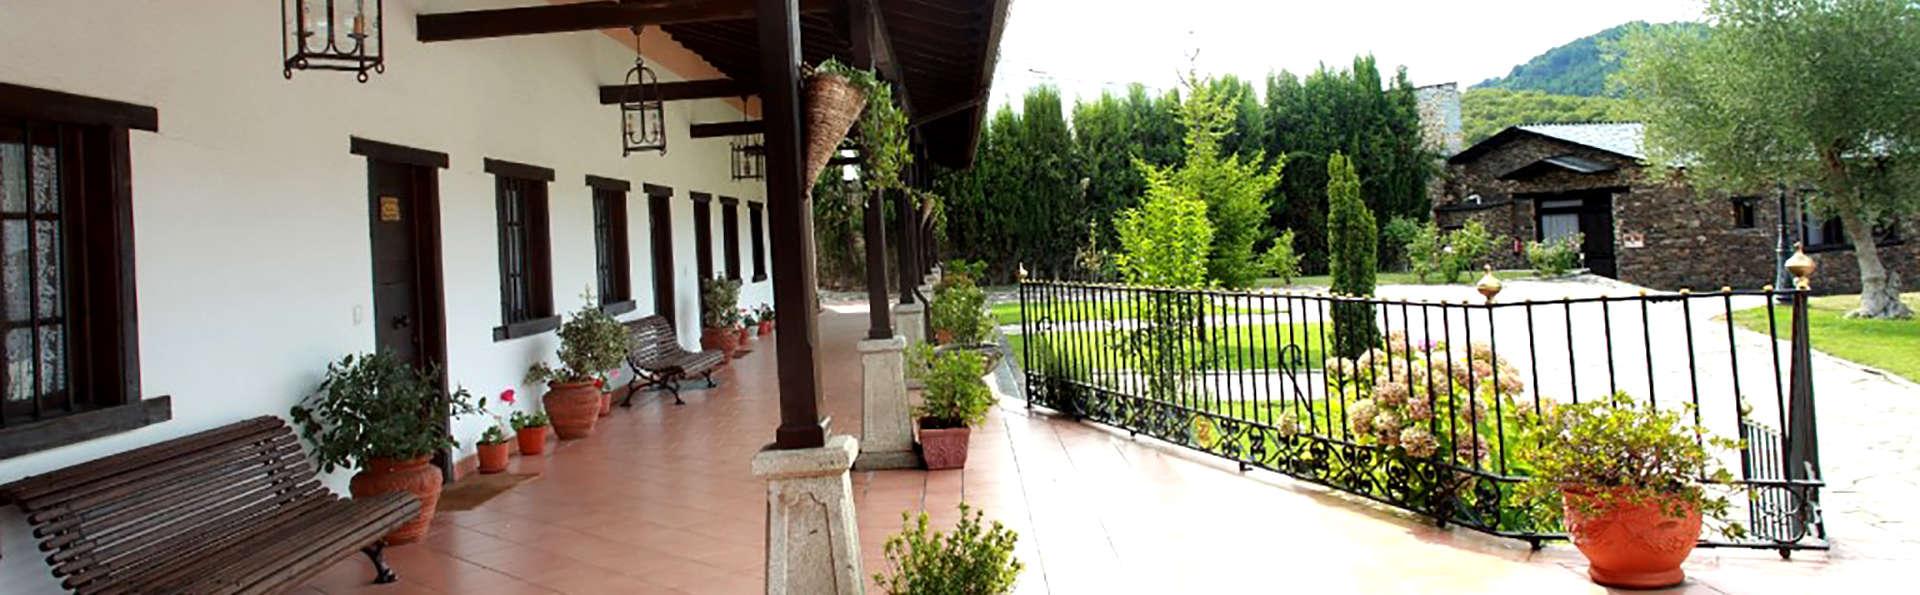 Hotel Monumento 4* Pazo Do Castro - Edit_terrace.jpg